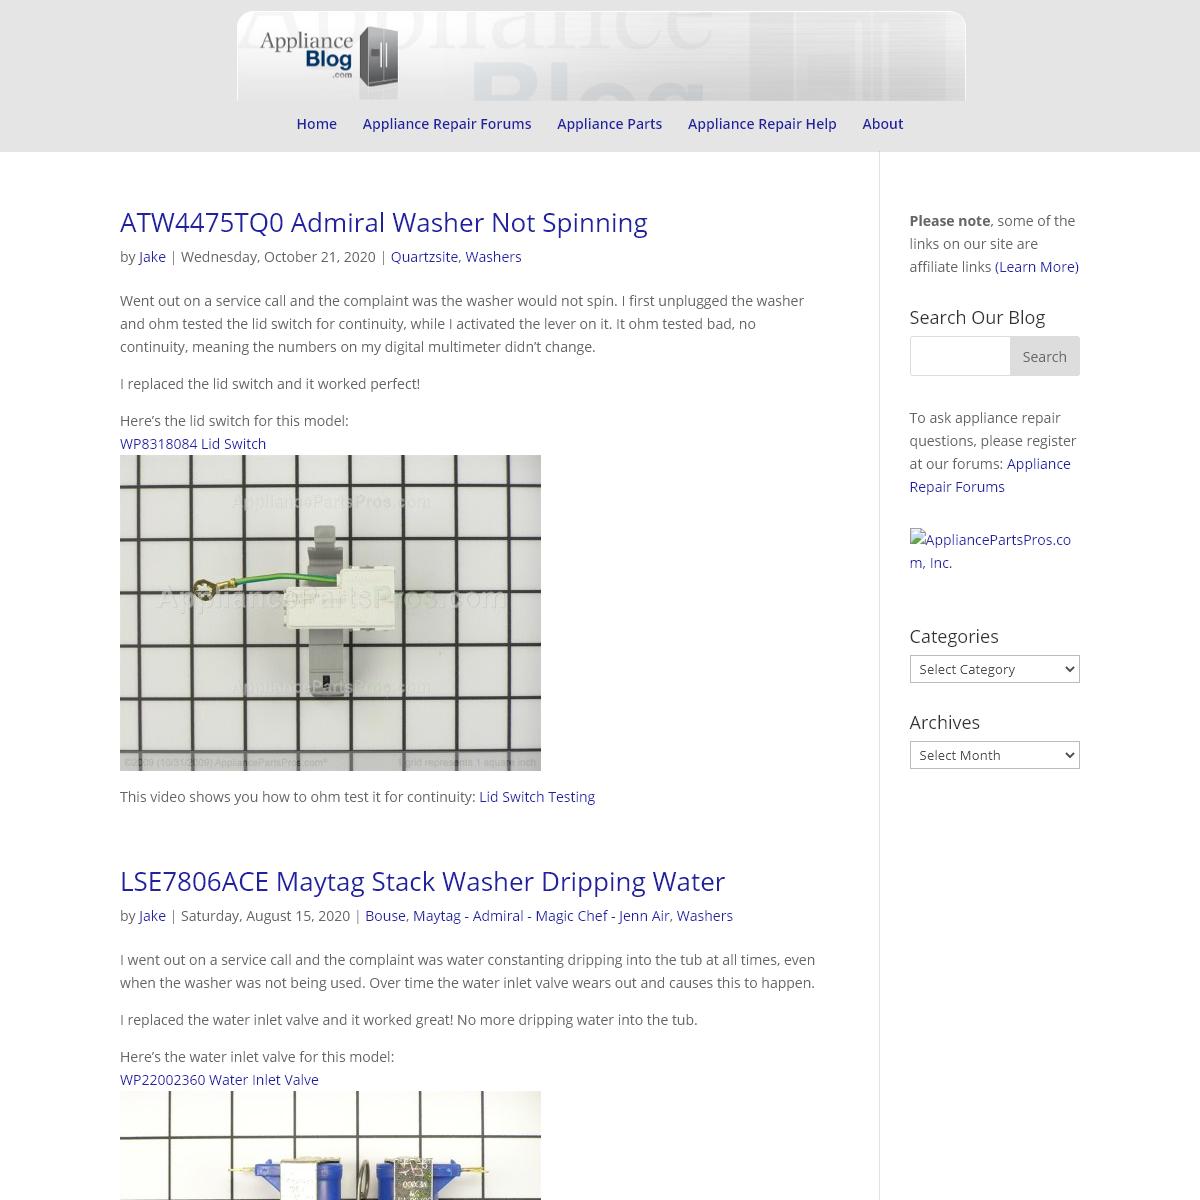 ApplianceBlog - Appliance Repair Blog Forums